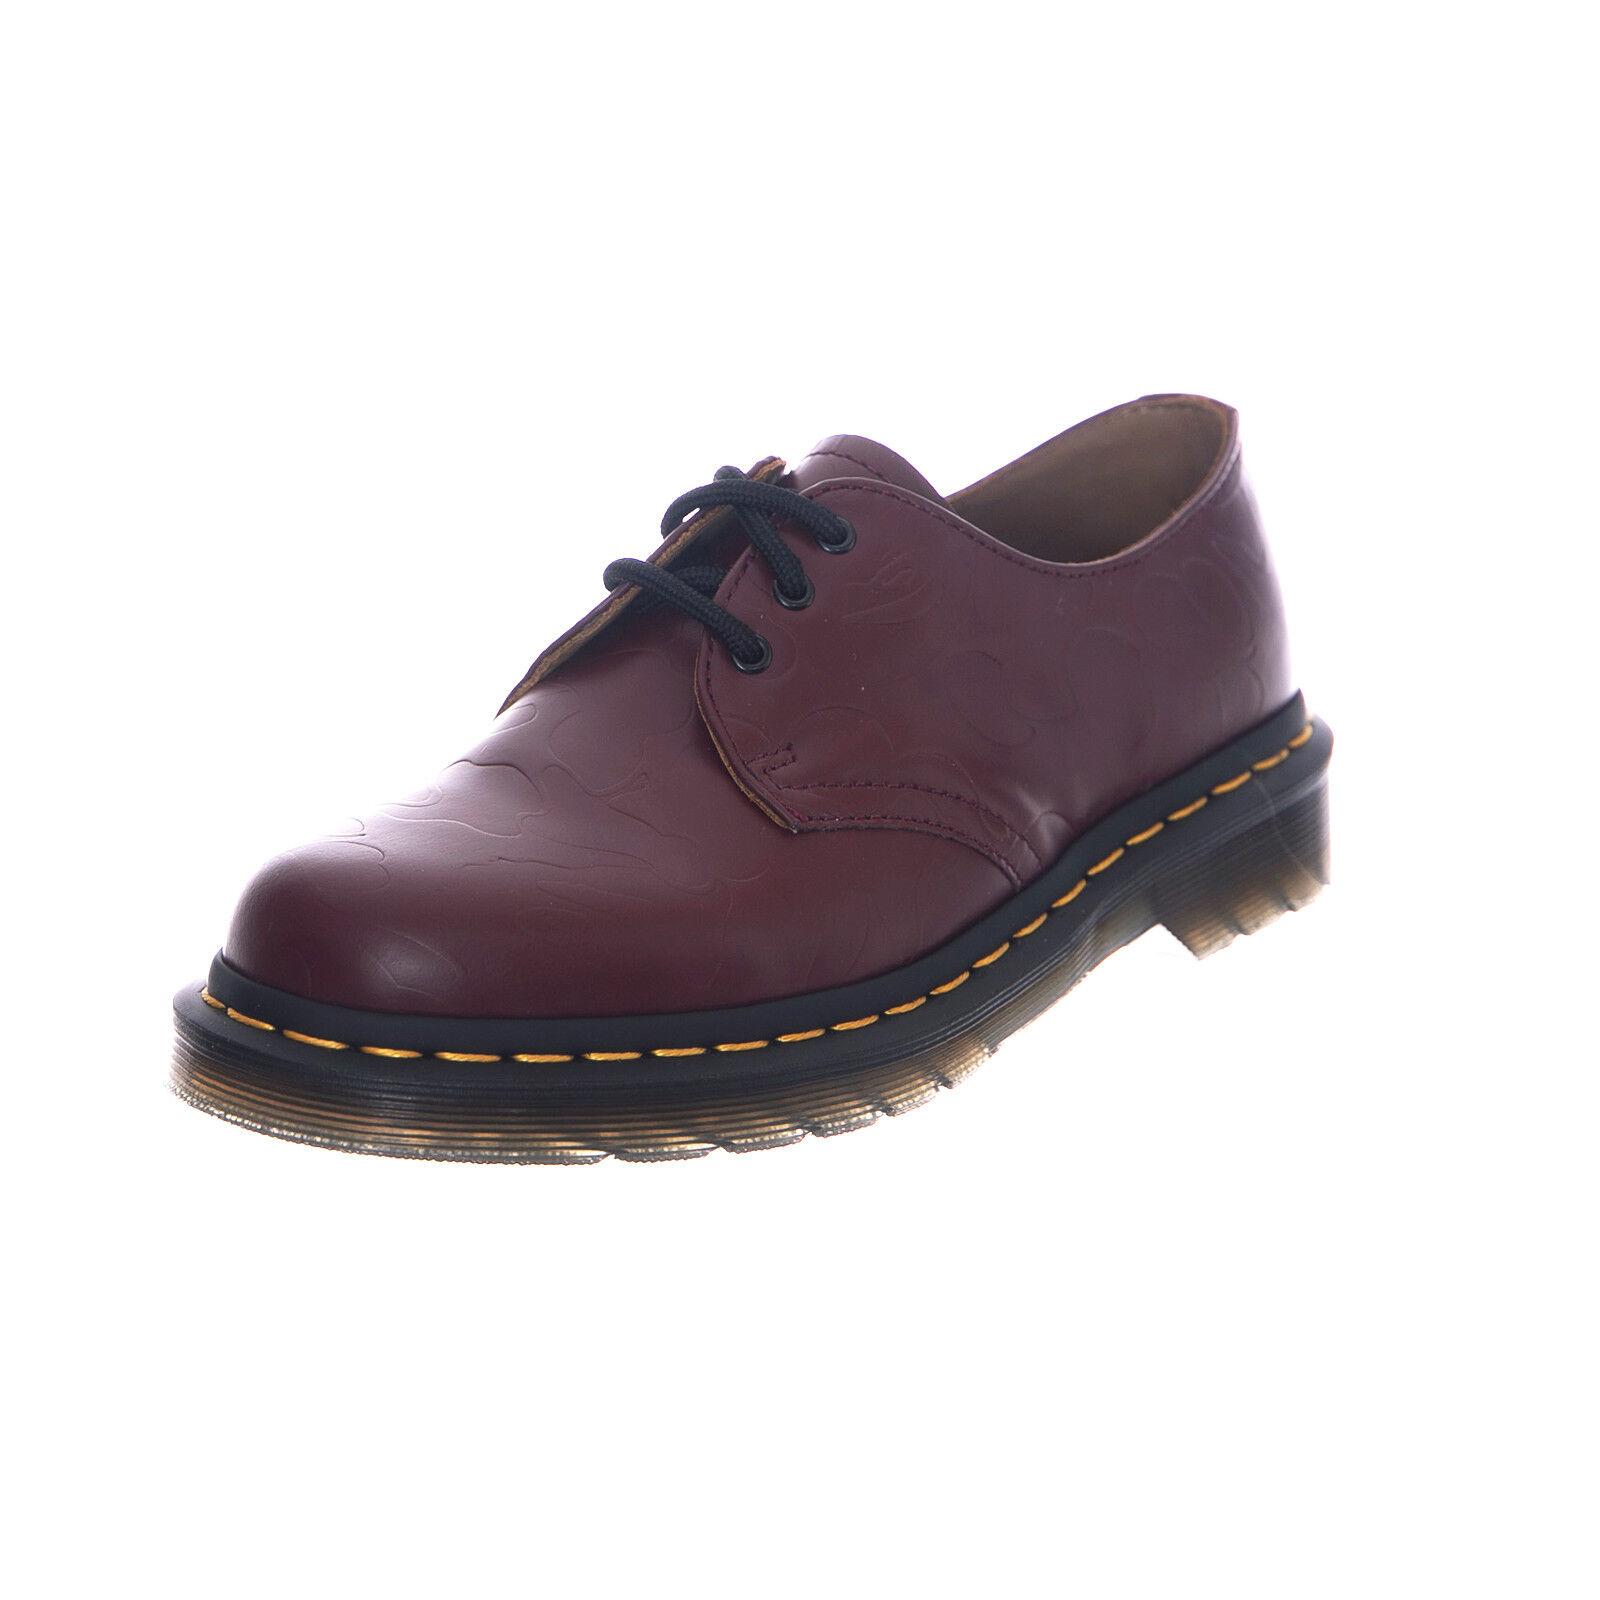 Dr.Martens Sneakers 1461 Bape Khaki Smooth Emboss Burgundy